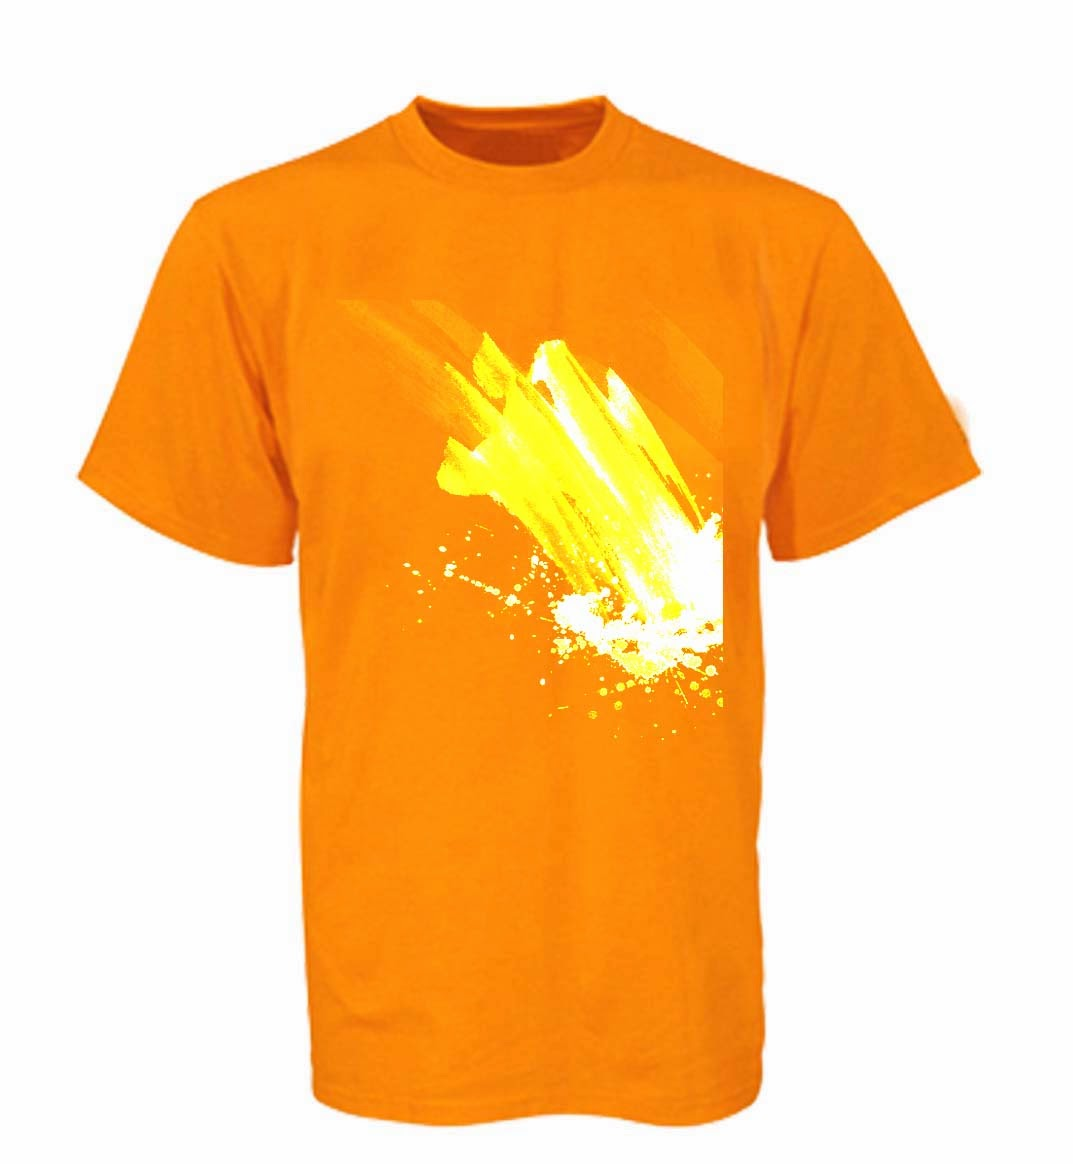 Spray Bleach TShirt Designs